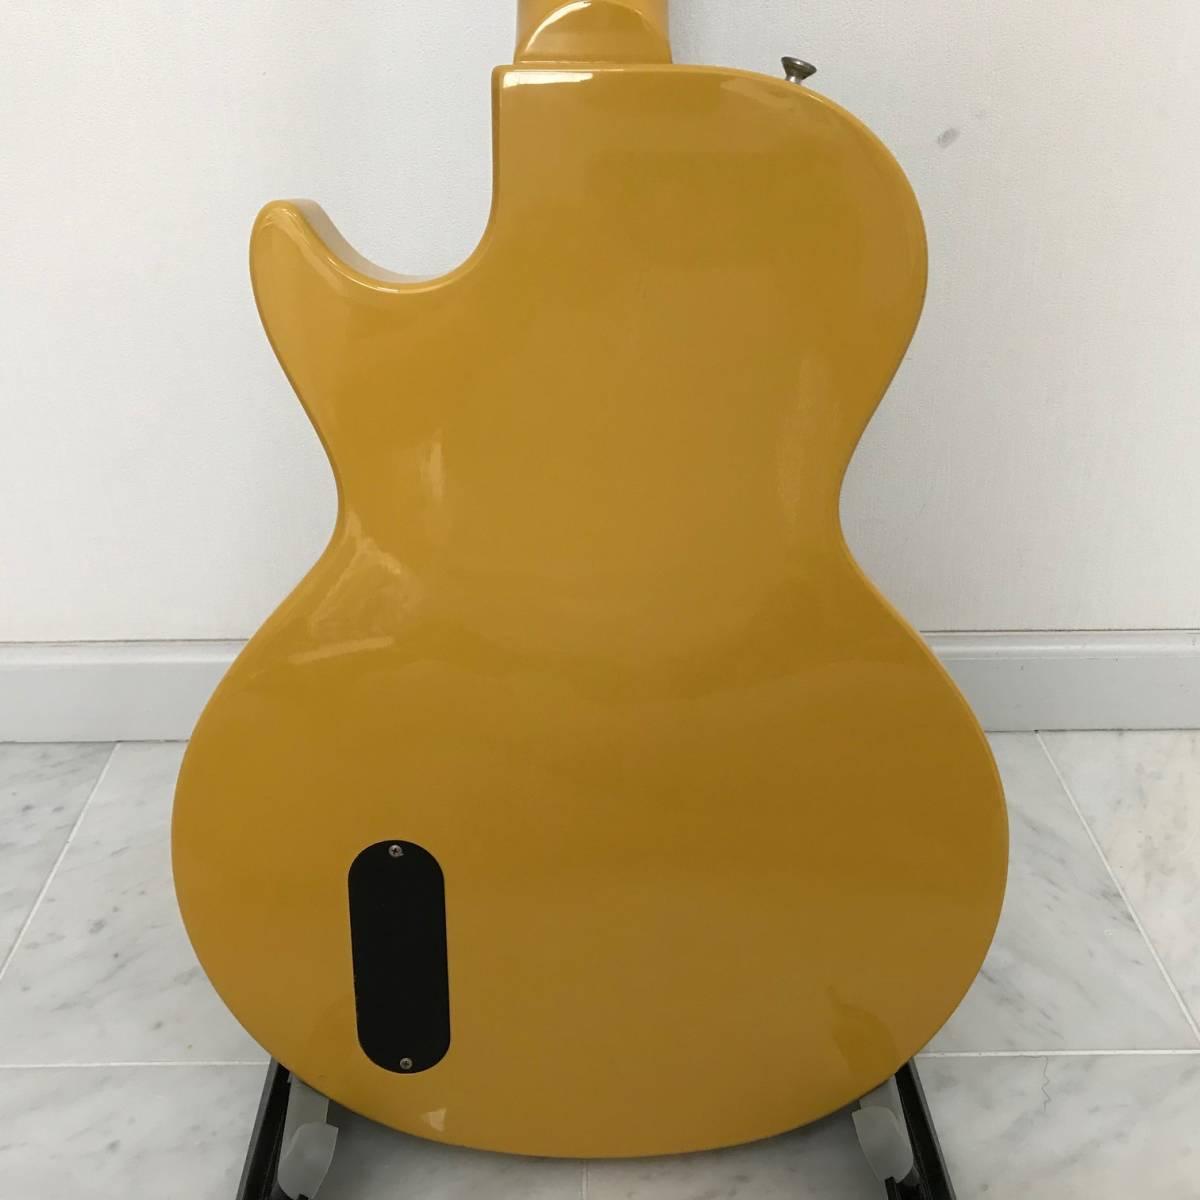 Orville by Gibson Les Paul Junior オービル バイ ギブソン レスポールジュニア イエロー 重量3.6kg_画像8